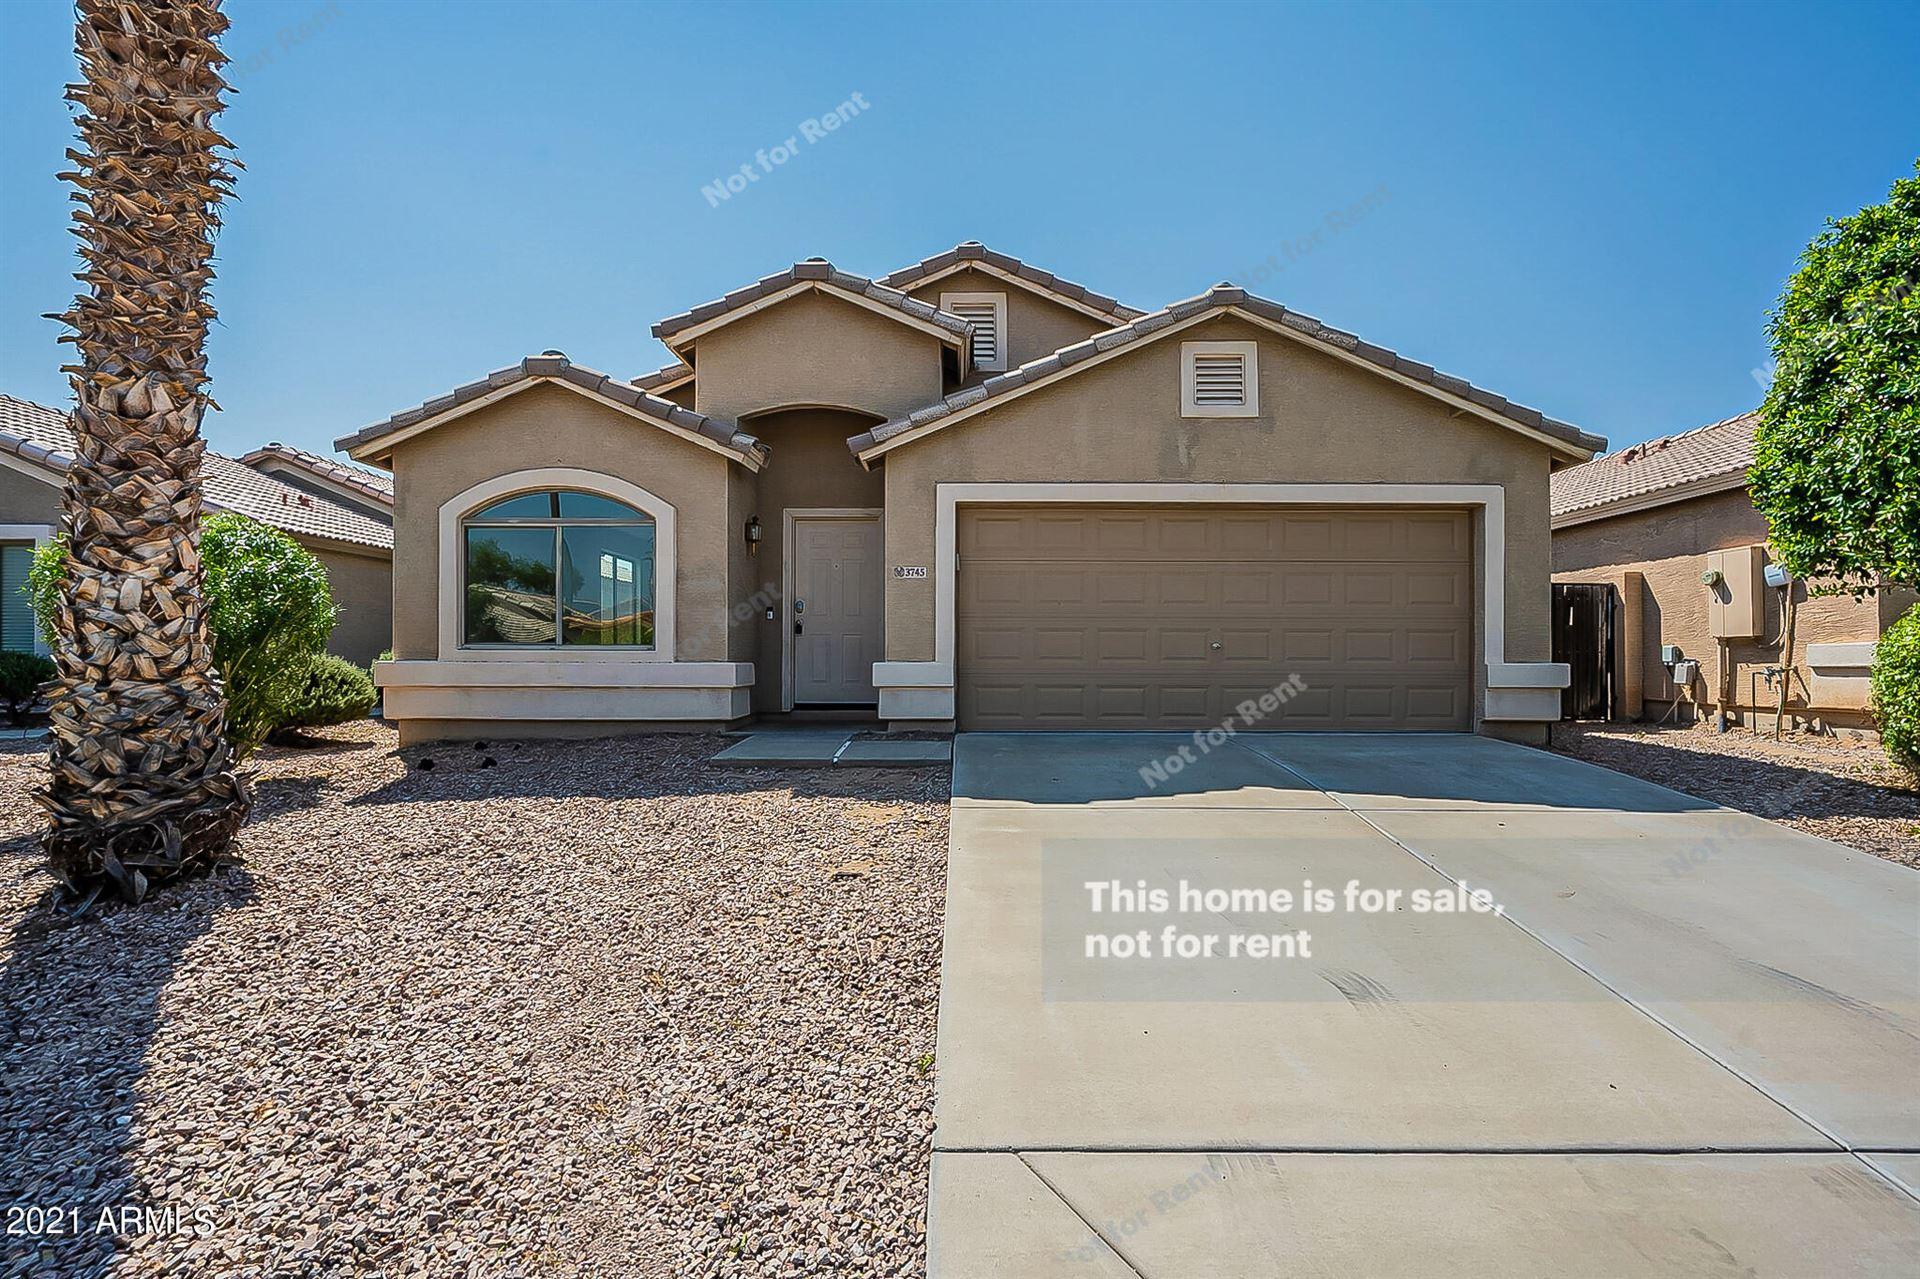 Photo of 3745 W SANTA CRUZ Avenue, Queen Creek, AZ 85142 (MLS # 6295221)